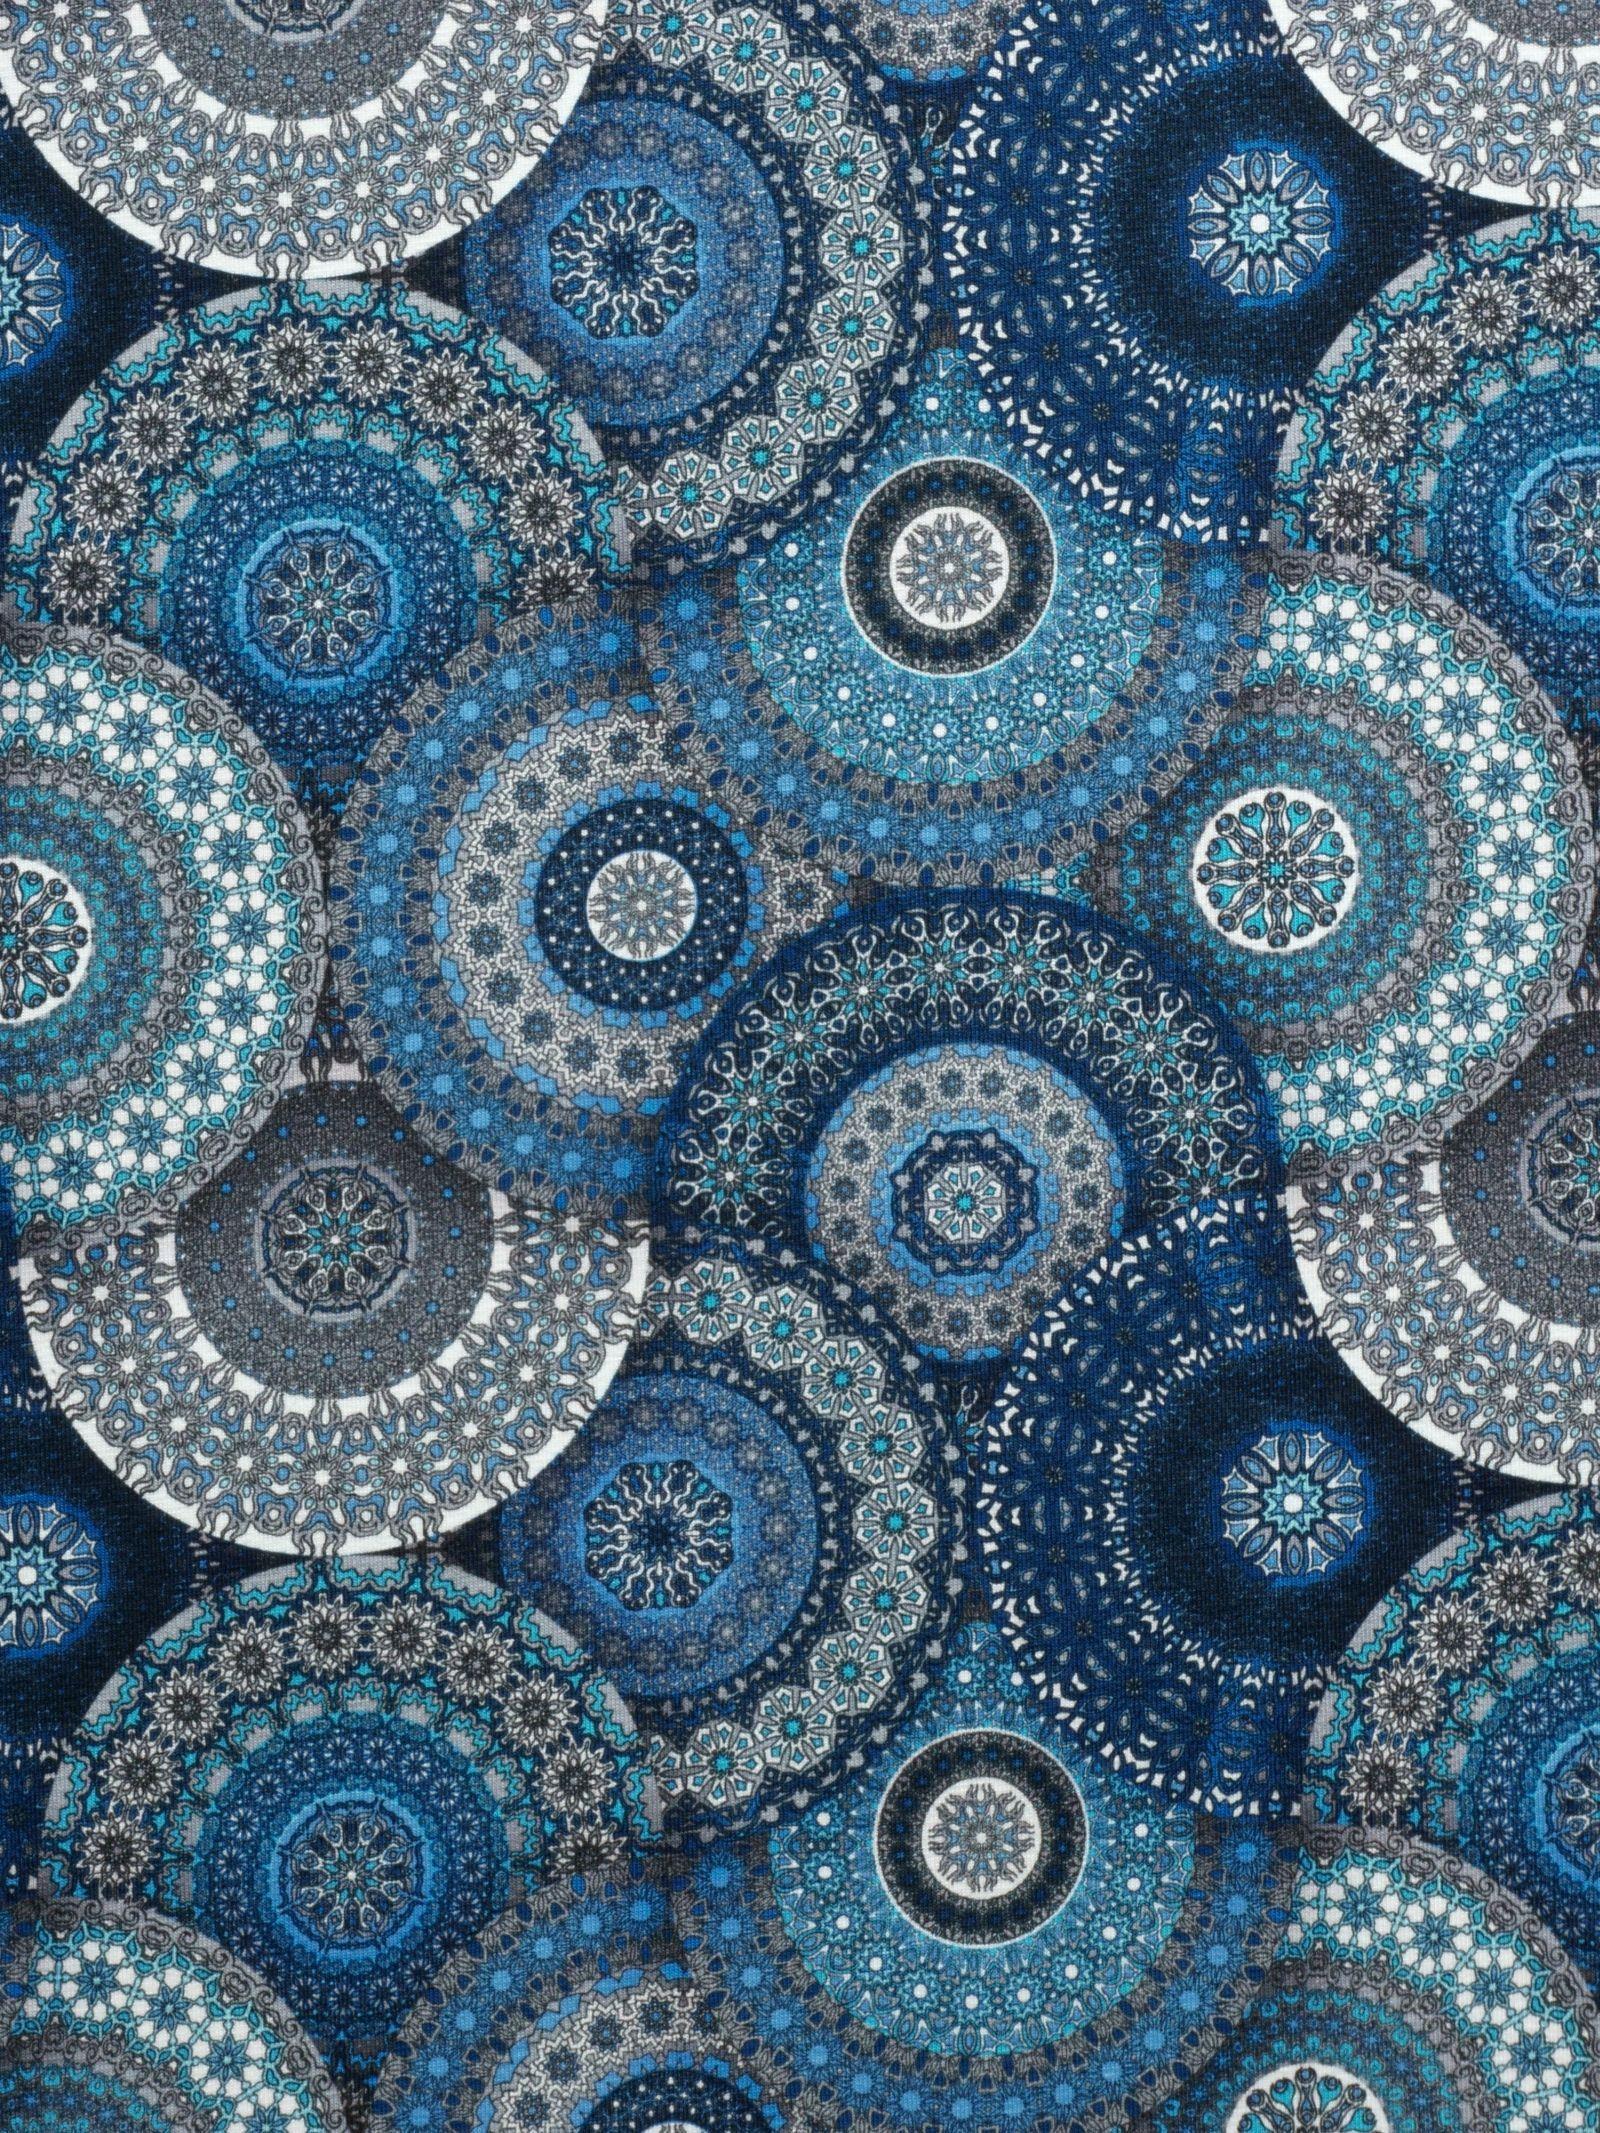 Jersey Stoff Blaue Mandalas Mandala Orientalisch Mystisch Meditation In 2020 Mandala Home Decor Quilts